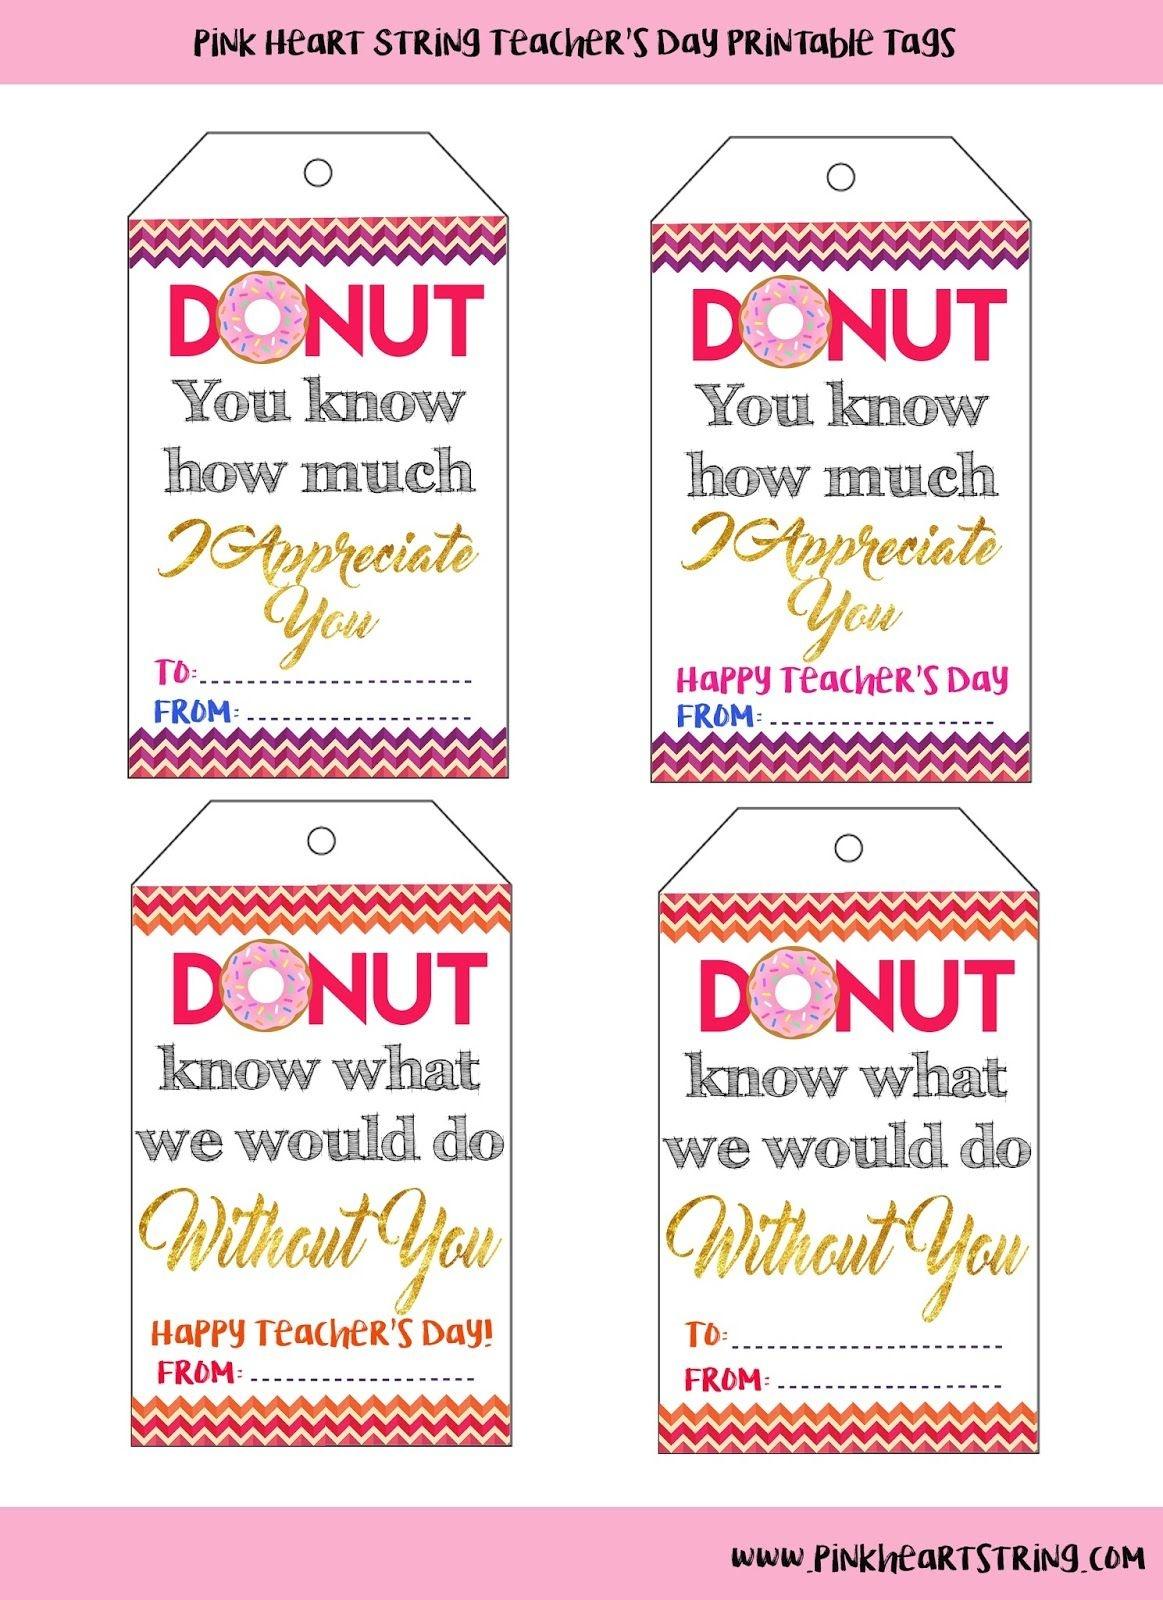 Print This Free Teacher Appreciation Printables Pdf If You Are - Free Printable Tags For Teacher Appreciation